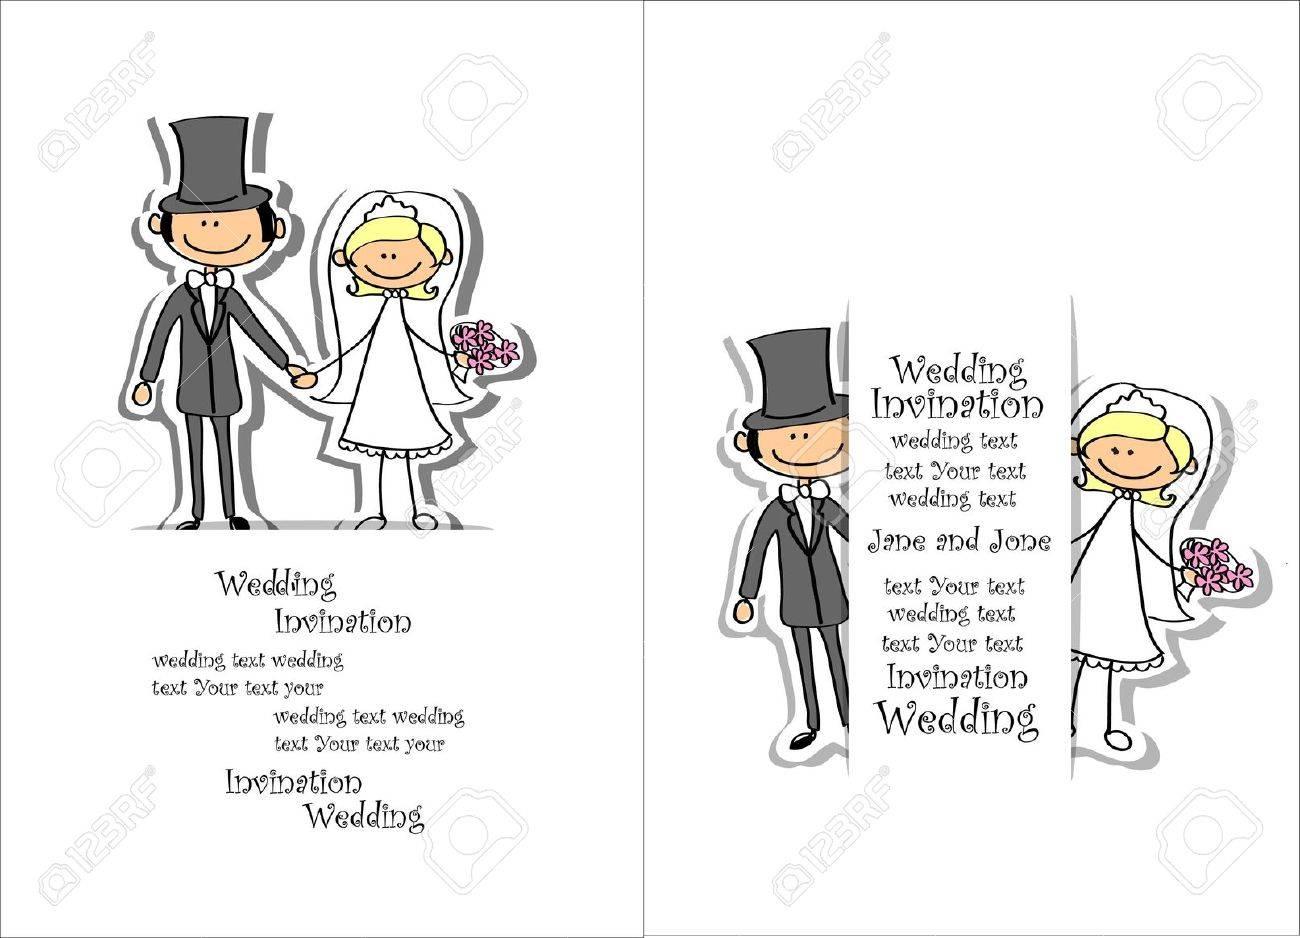 Cartoon wedding picture - 17686308